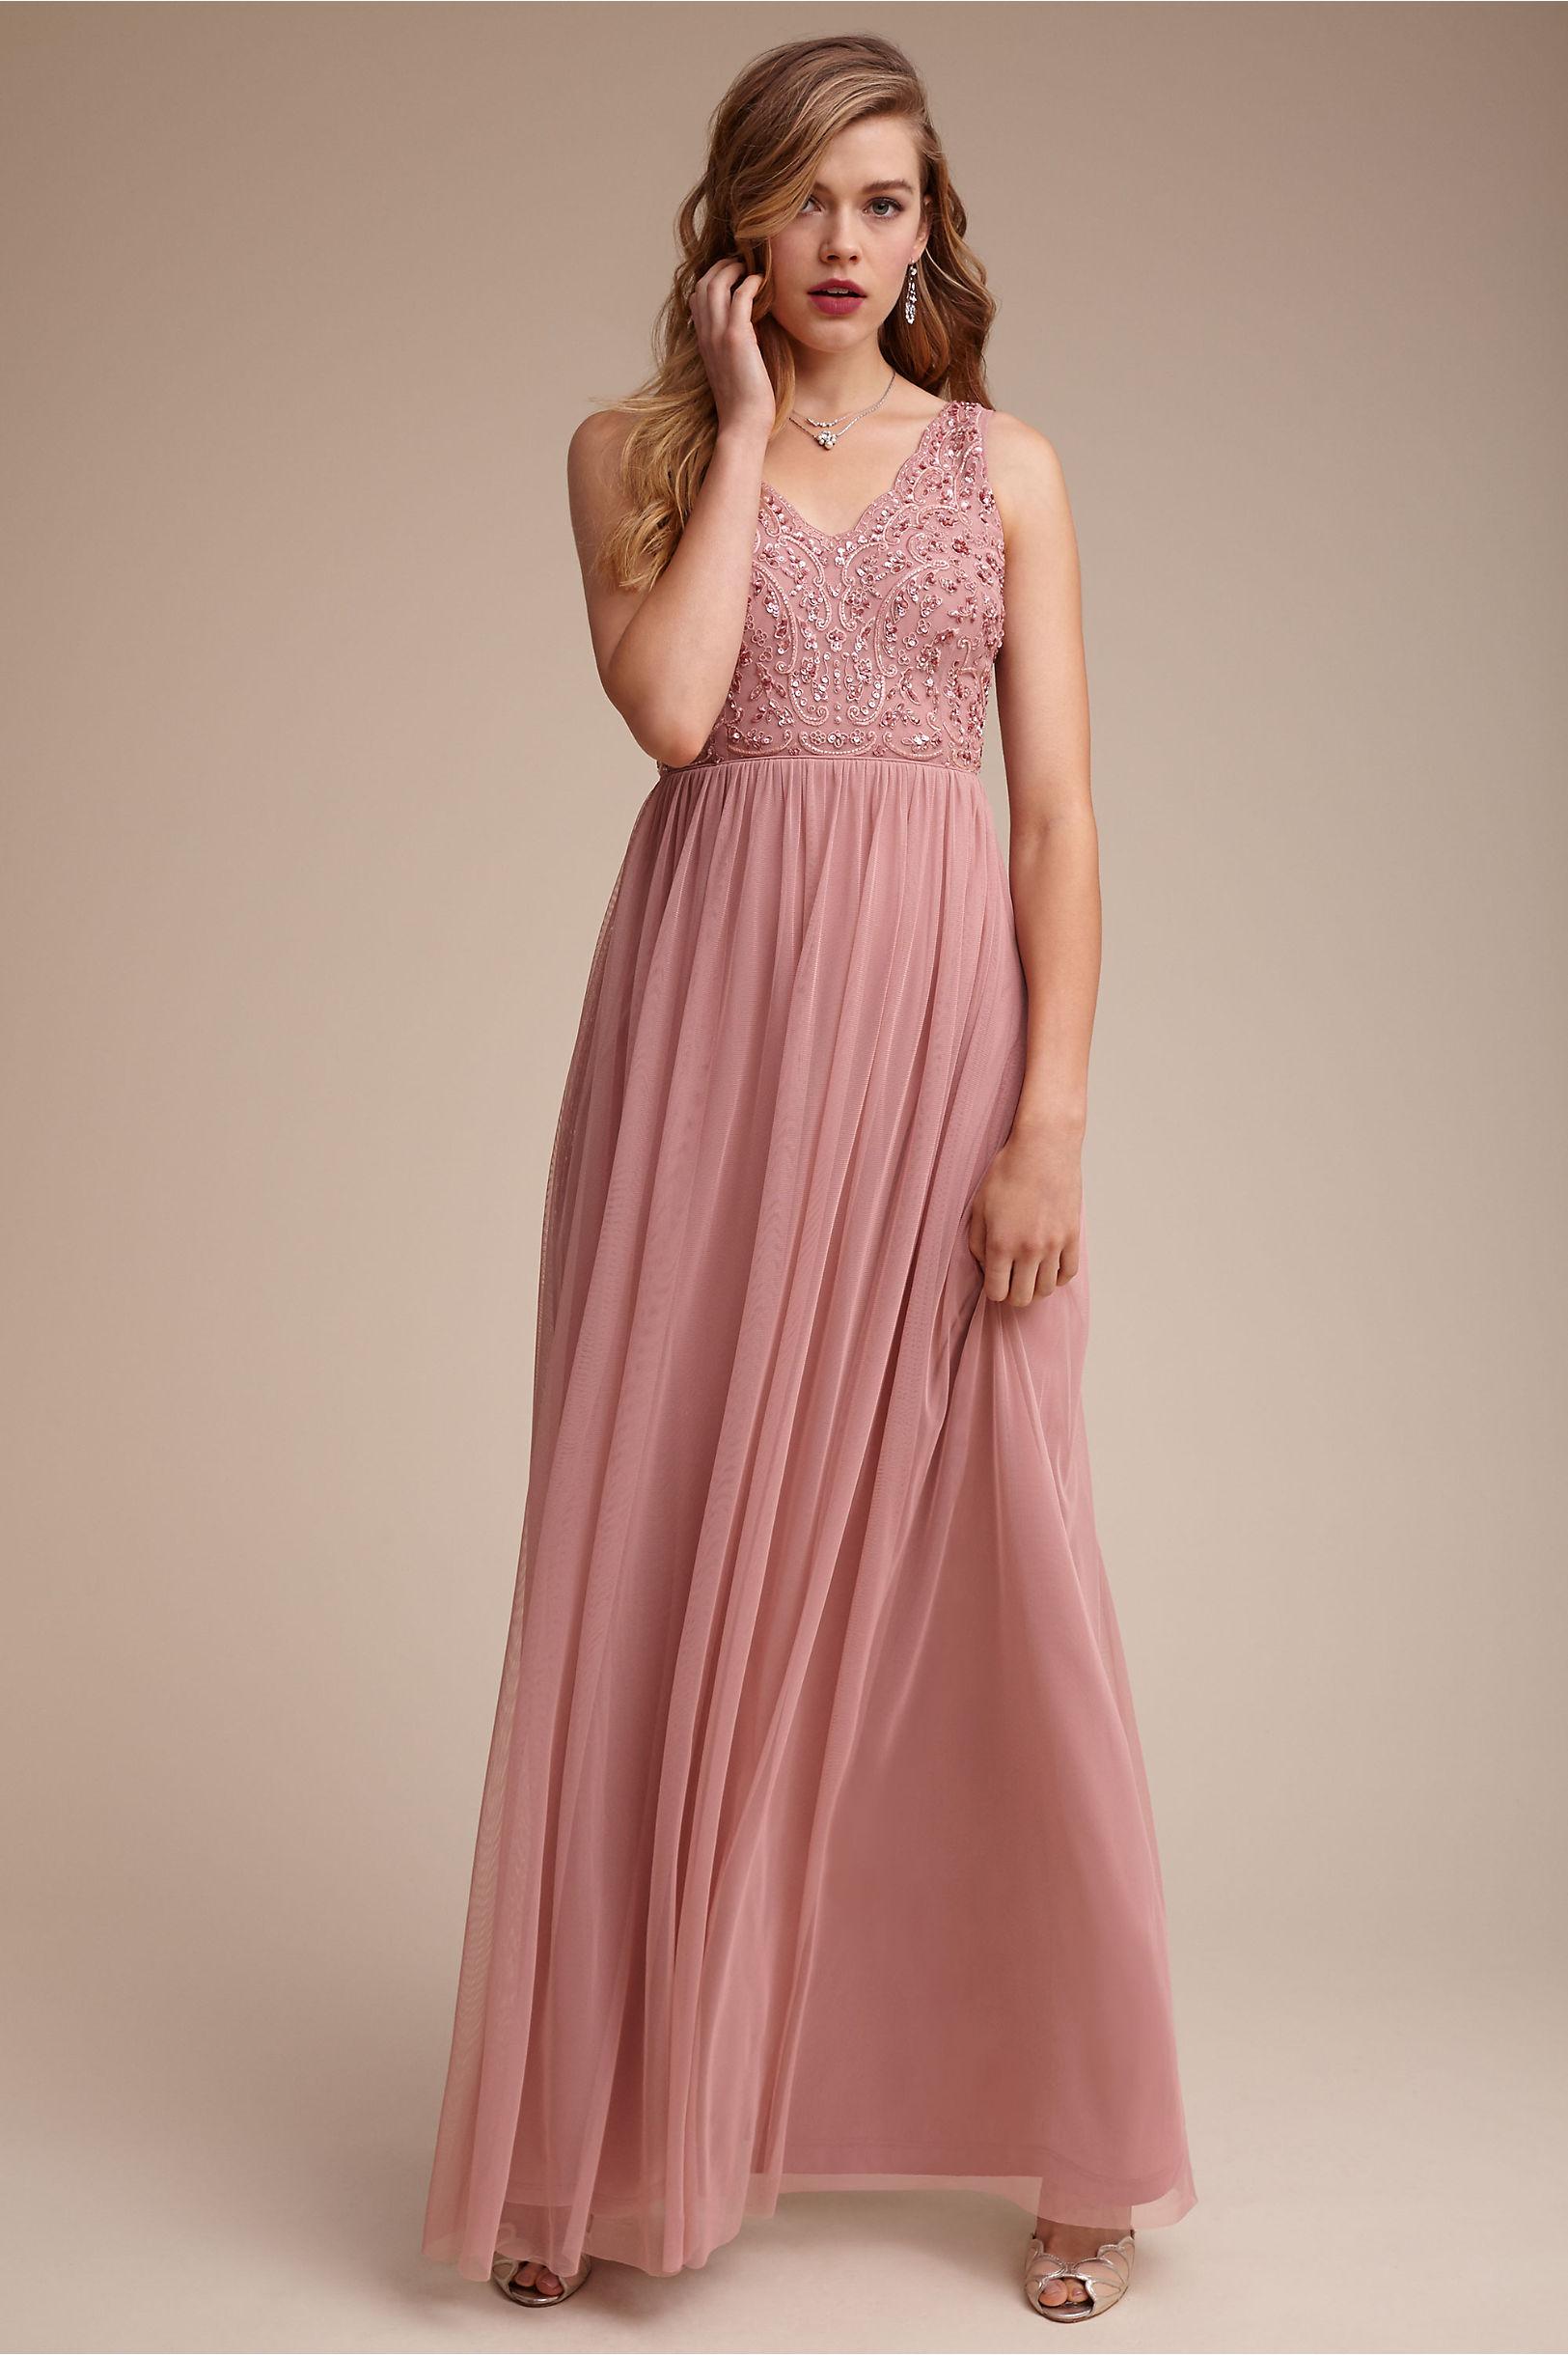 Orlene Dress in Sale | BHLDN